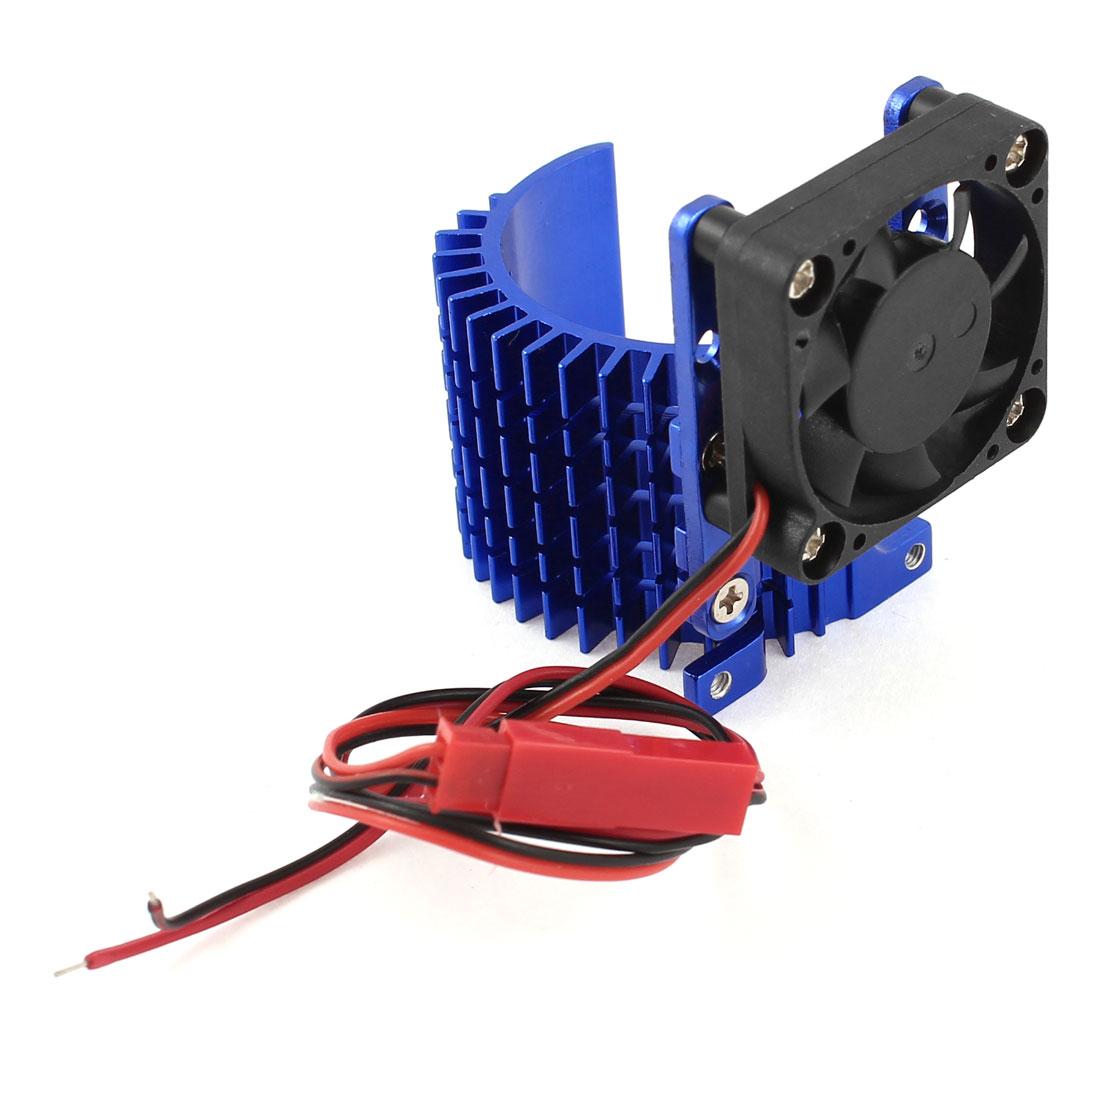 Blue Aluminum Alloy Heatsink w 5V Cooling Fan for 1/10 Car 540 3650 Size Motor